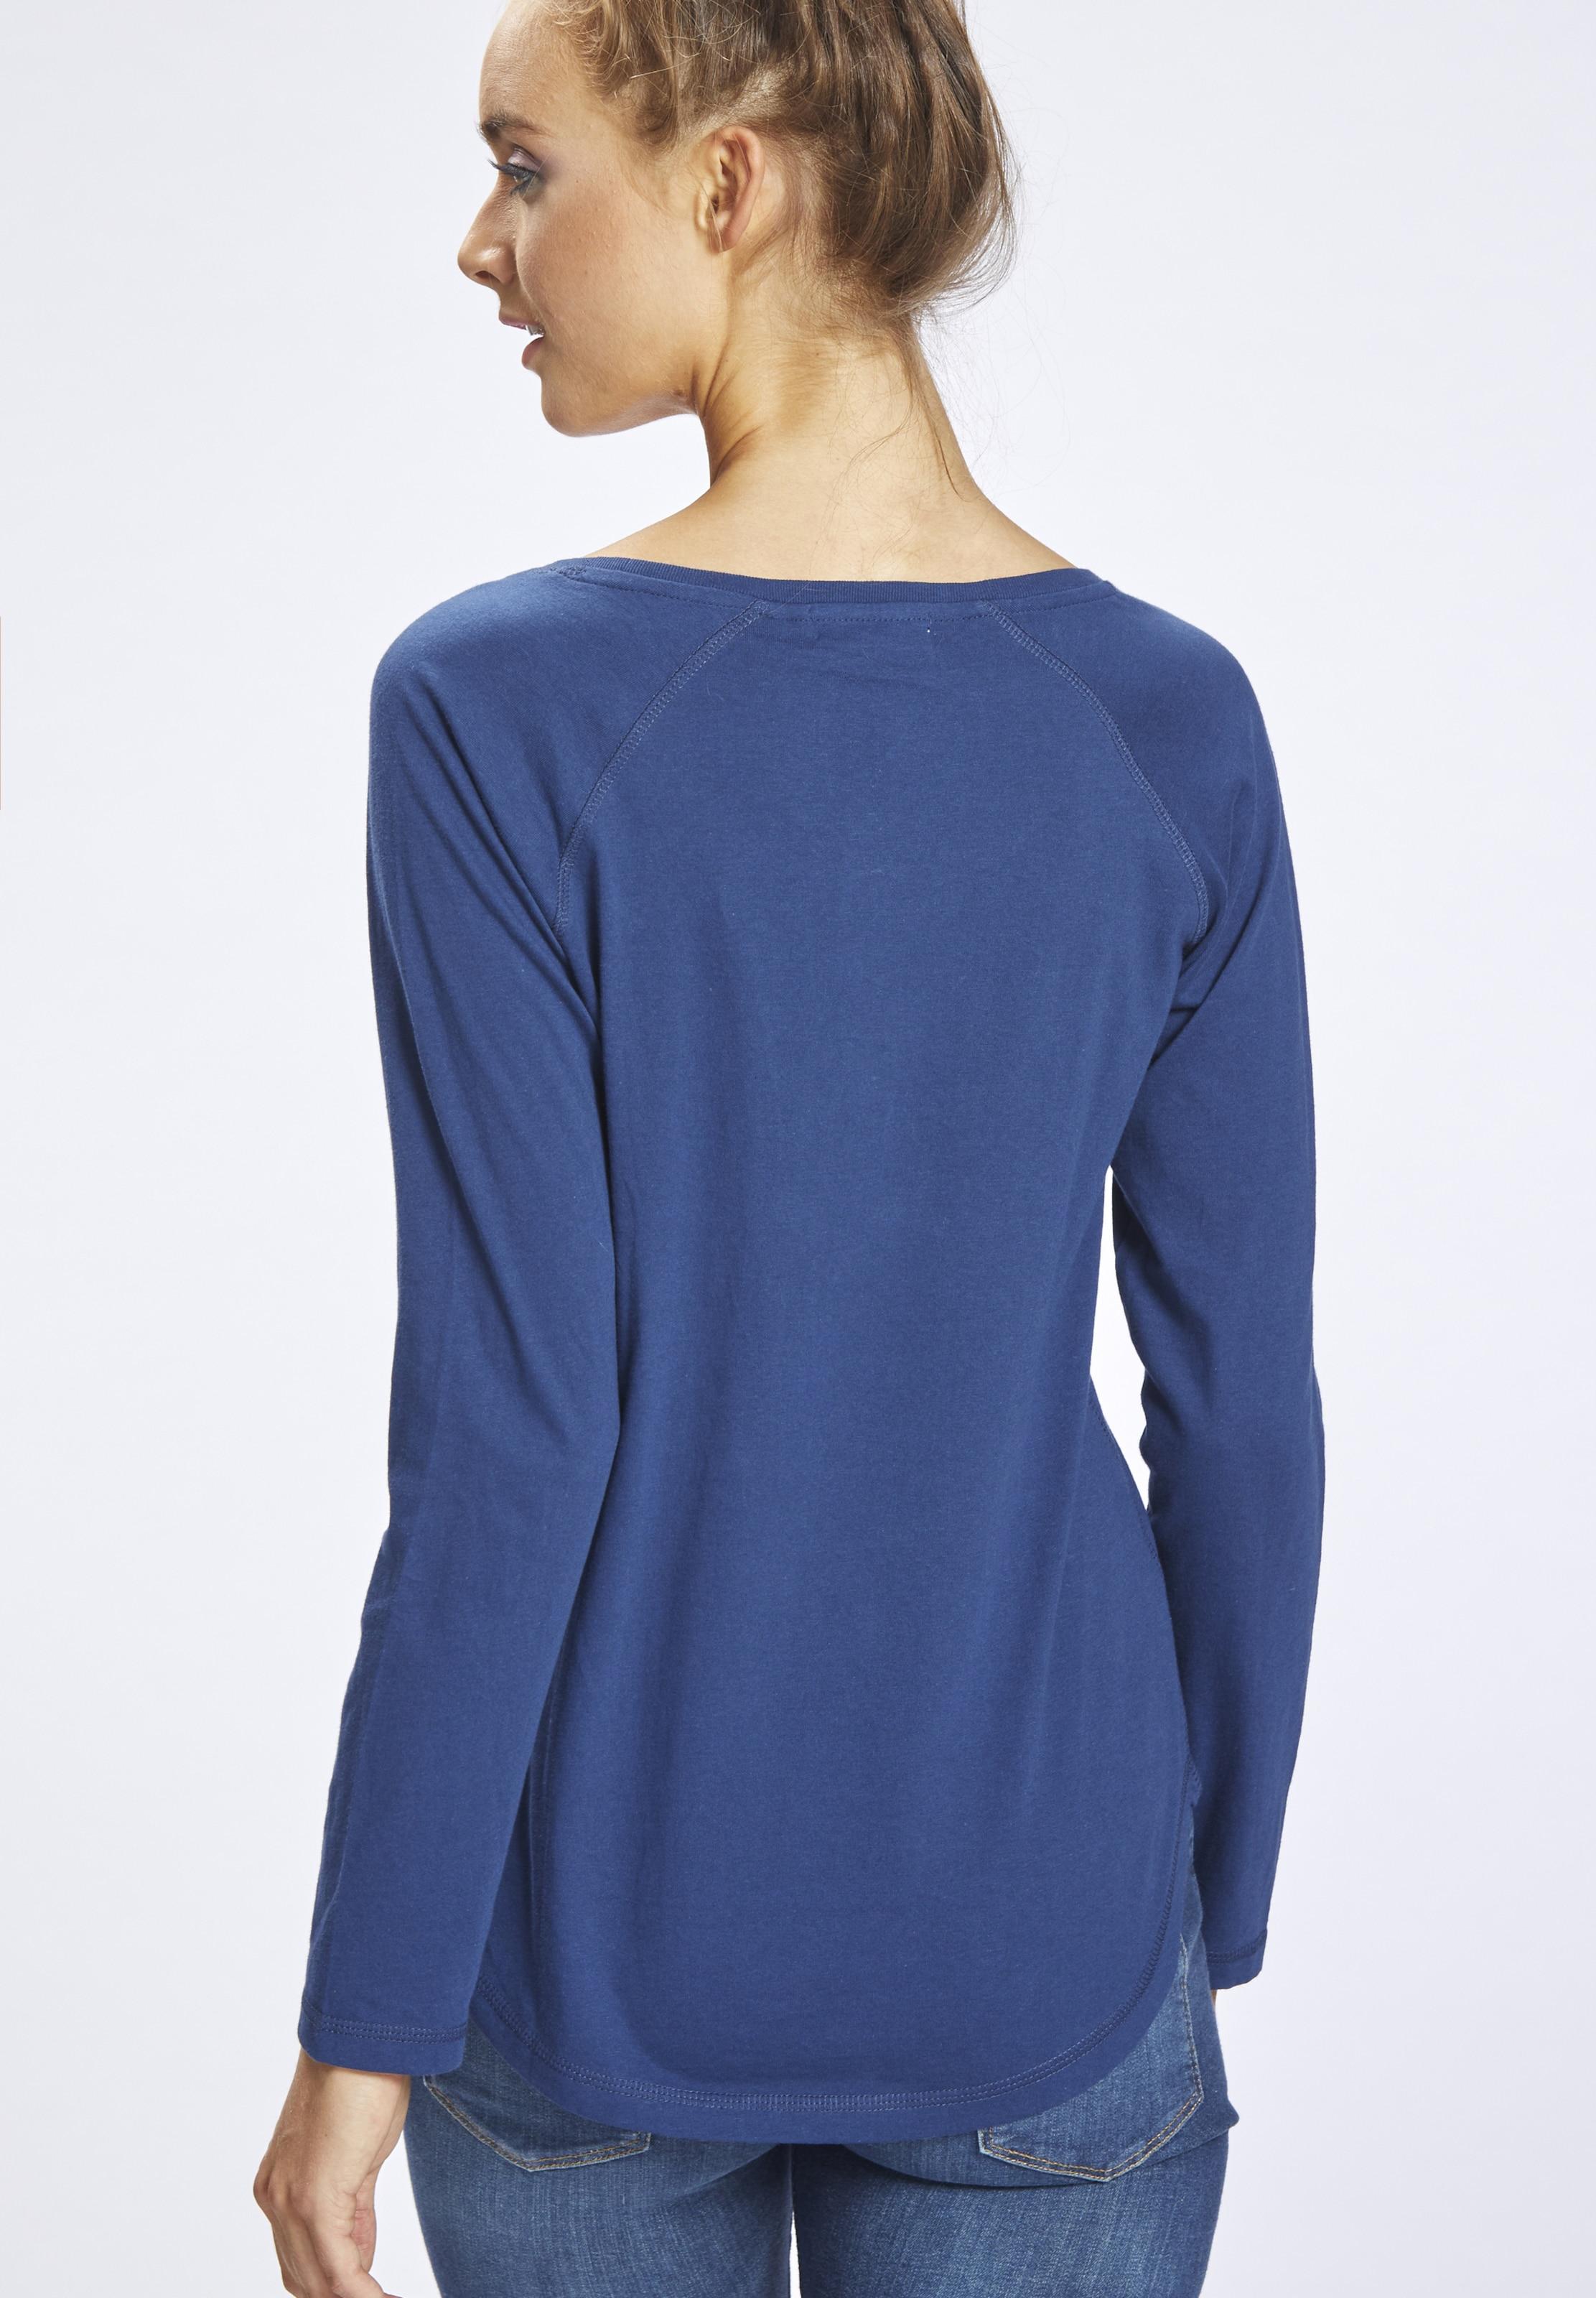 Mymo T En Mymo Blanc T En Blanc shirt shirt Mymo 9WDHE2I